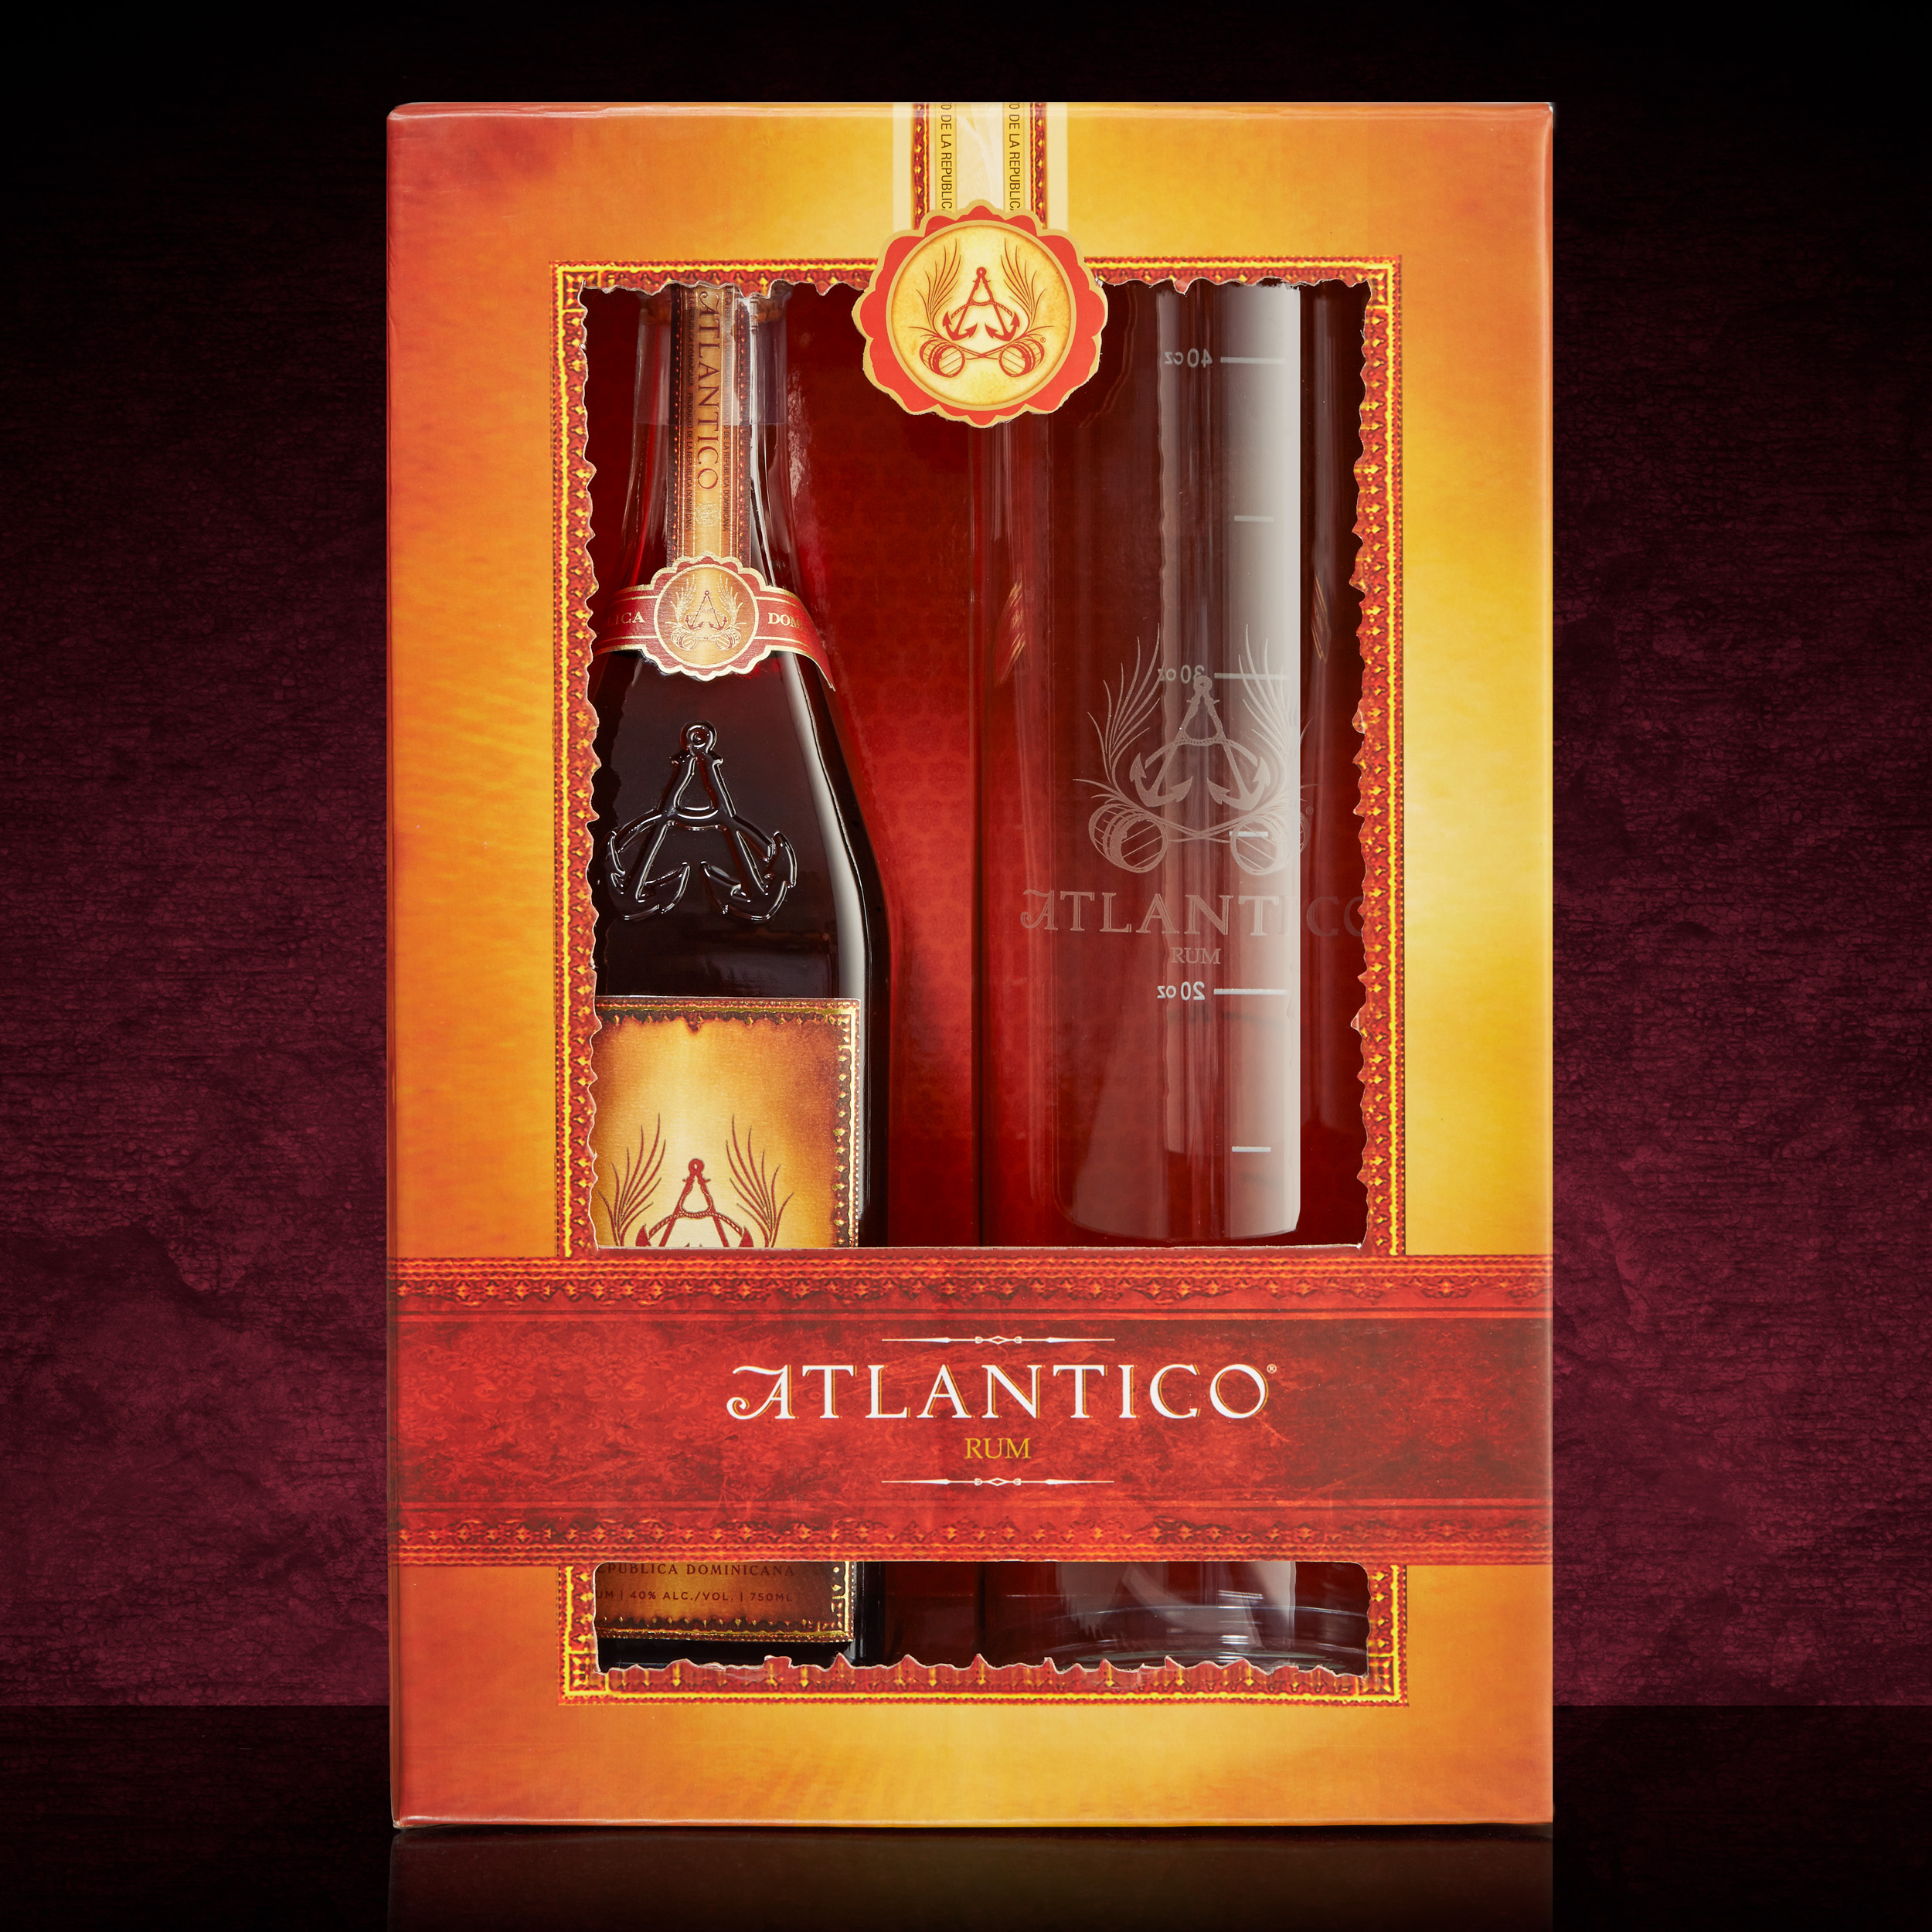 Atlantico_VAP_Box_Miami_Fort_Lauderdale_product_photographer_Franklin_Castillo-.jpg